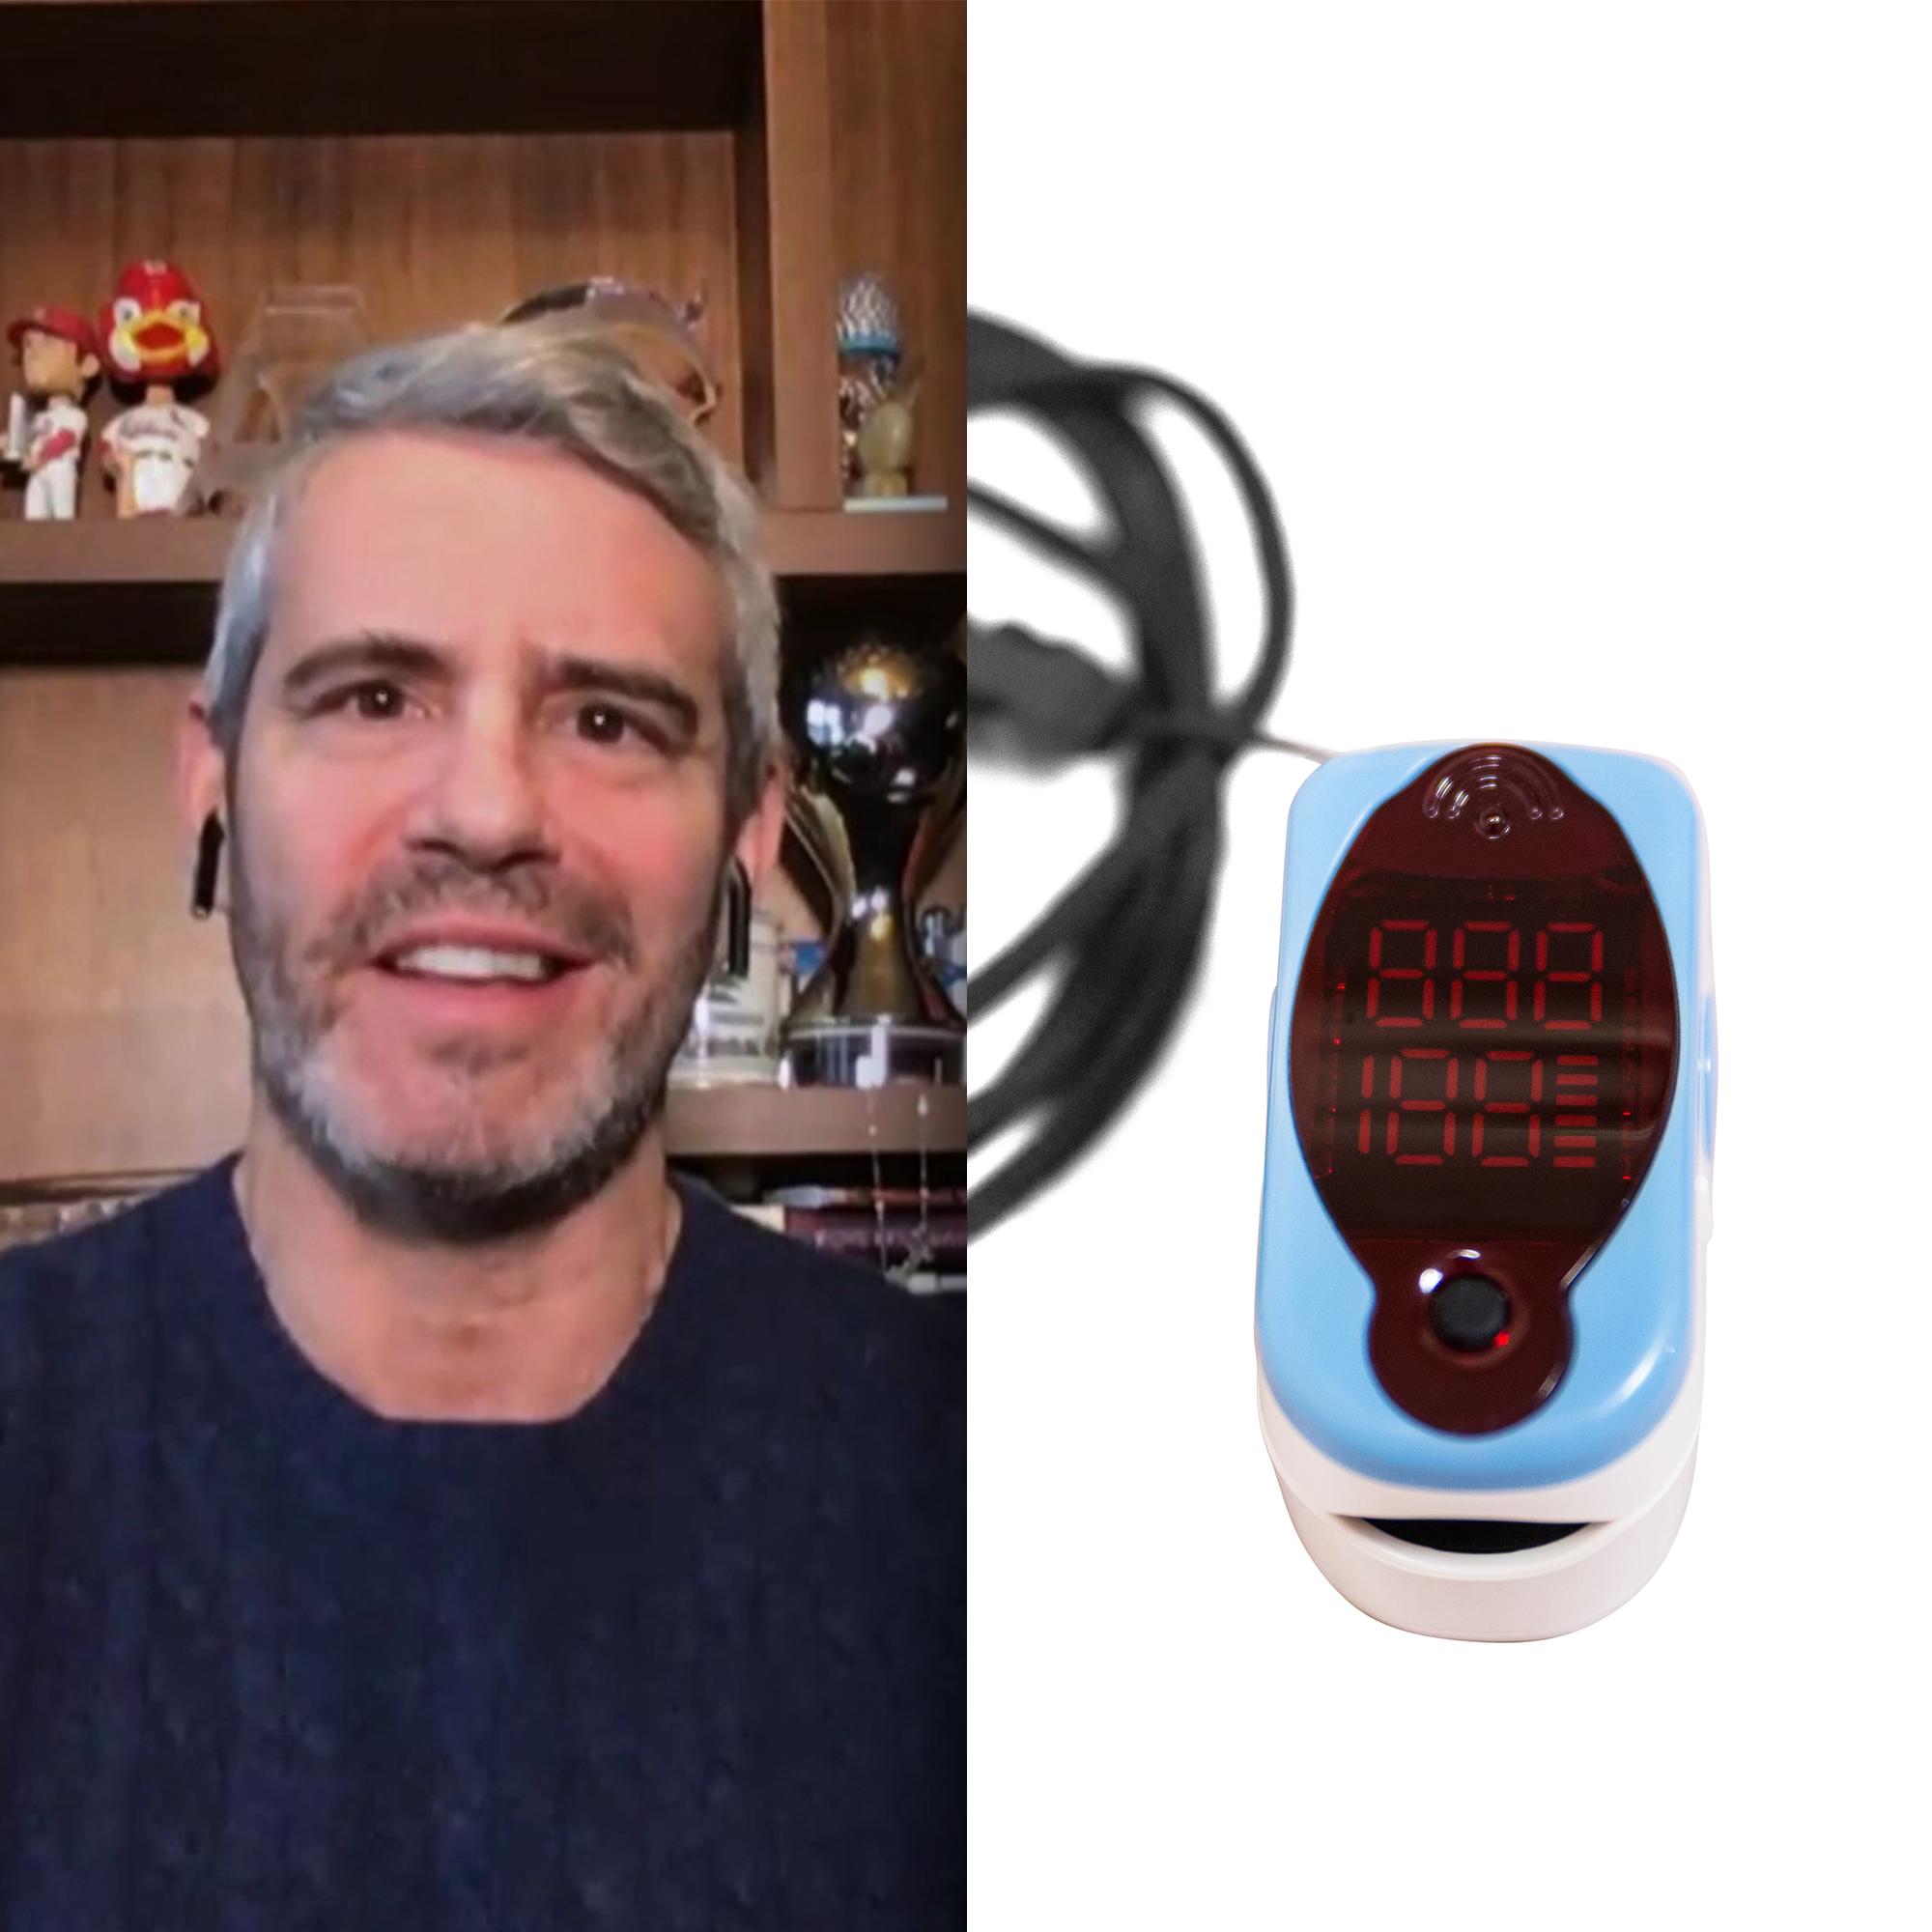 Pulse Oximeter Can Device Help Monitor Coronavirus Symptoms At Home